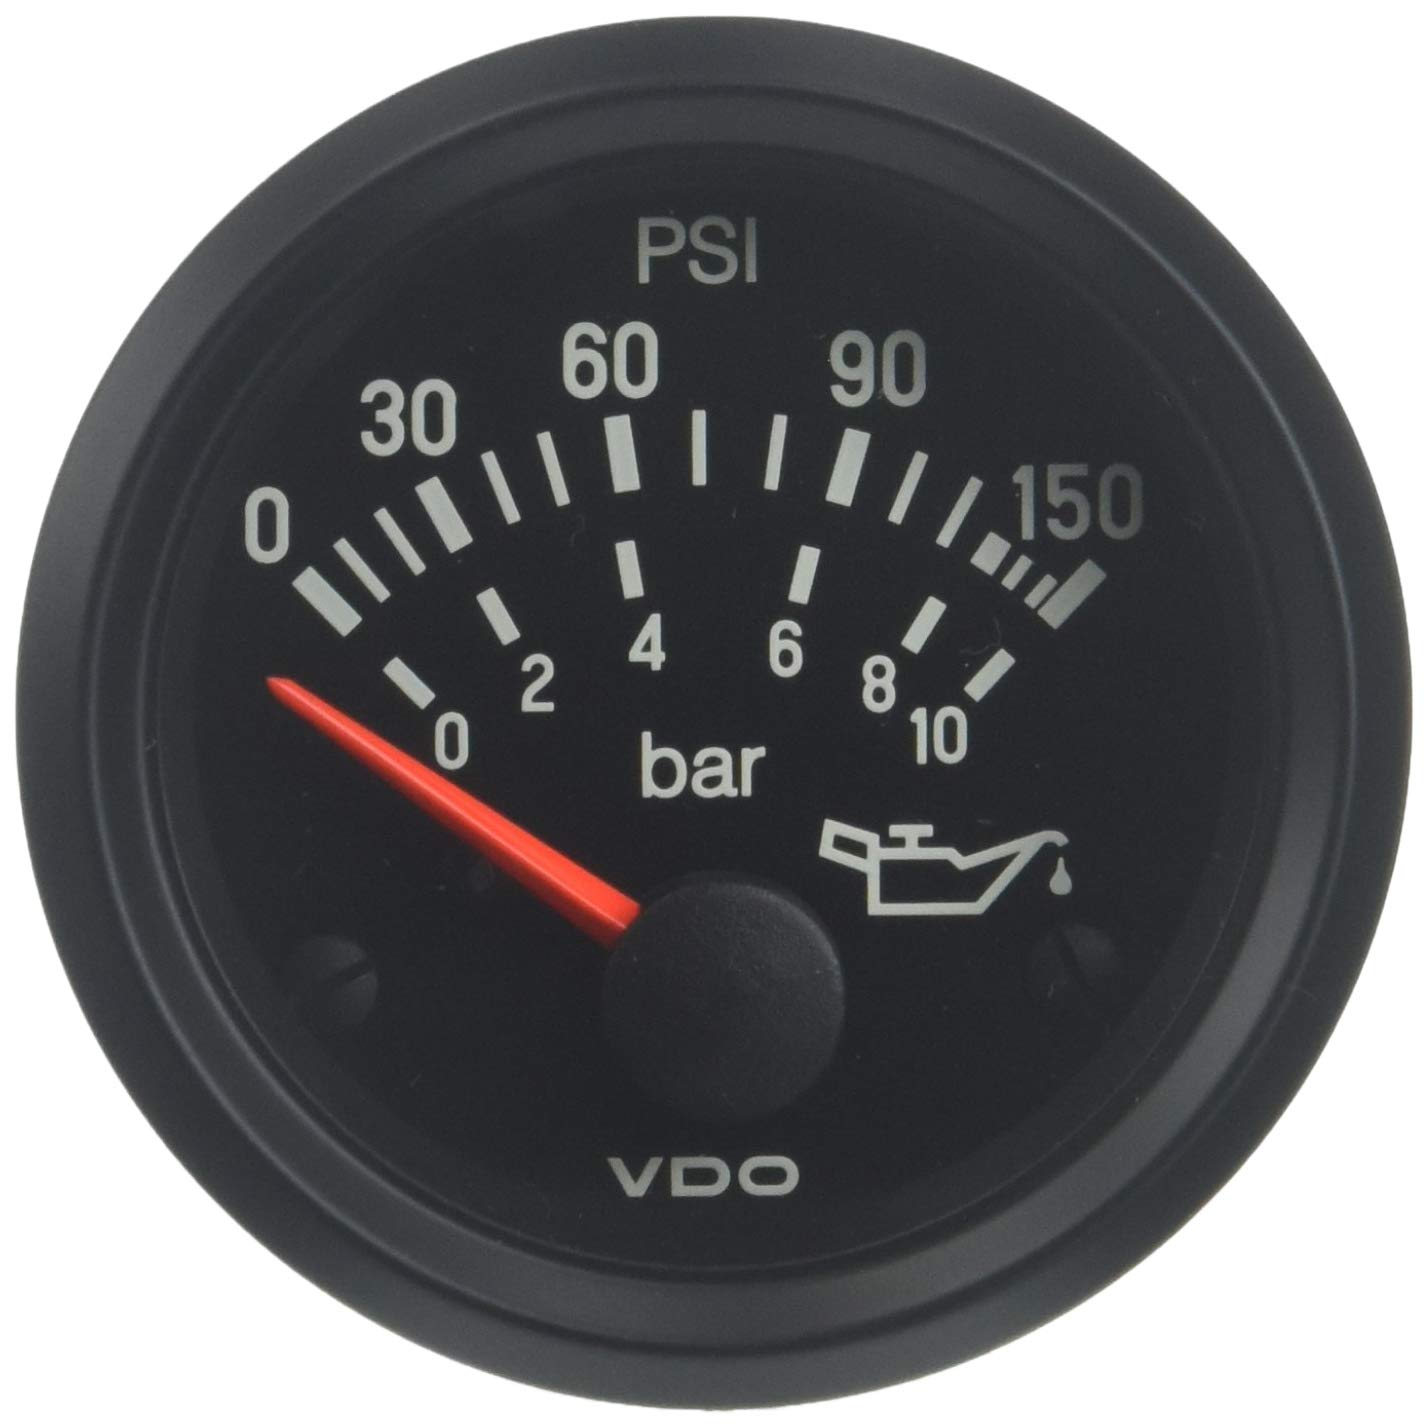 VDO 350 910 Oil Pressure Gauge